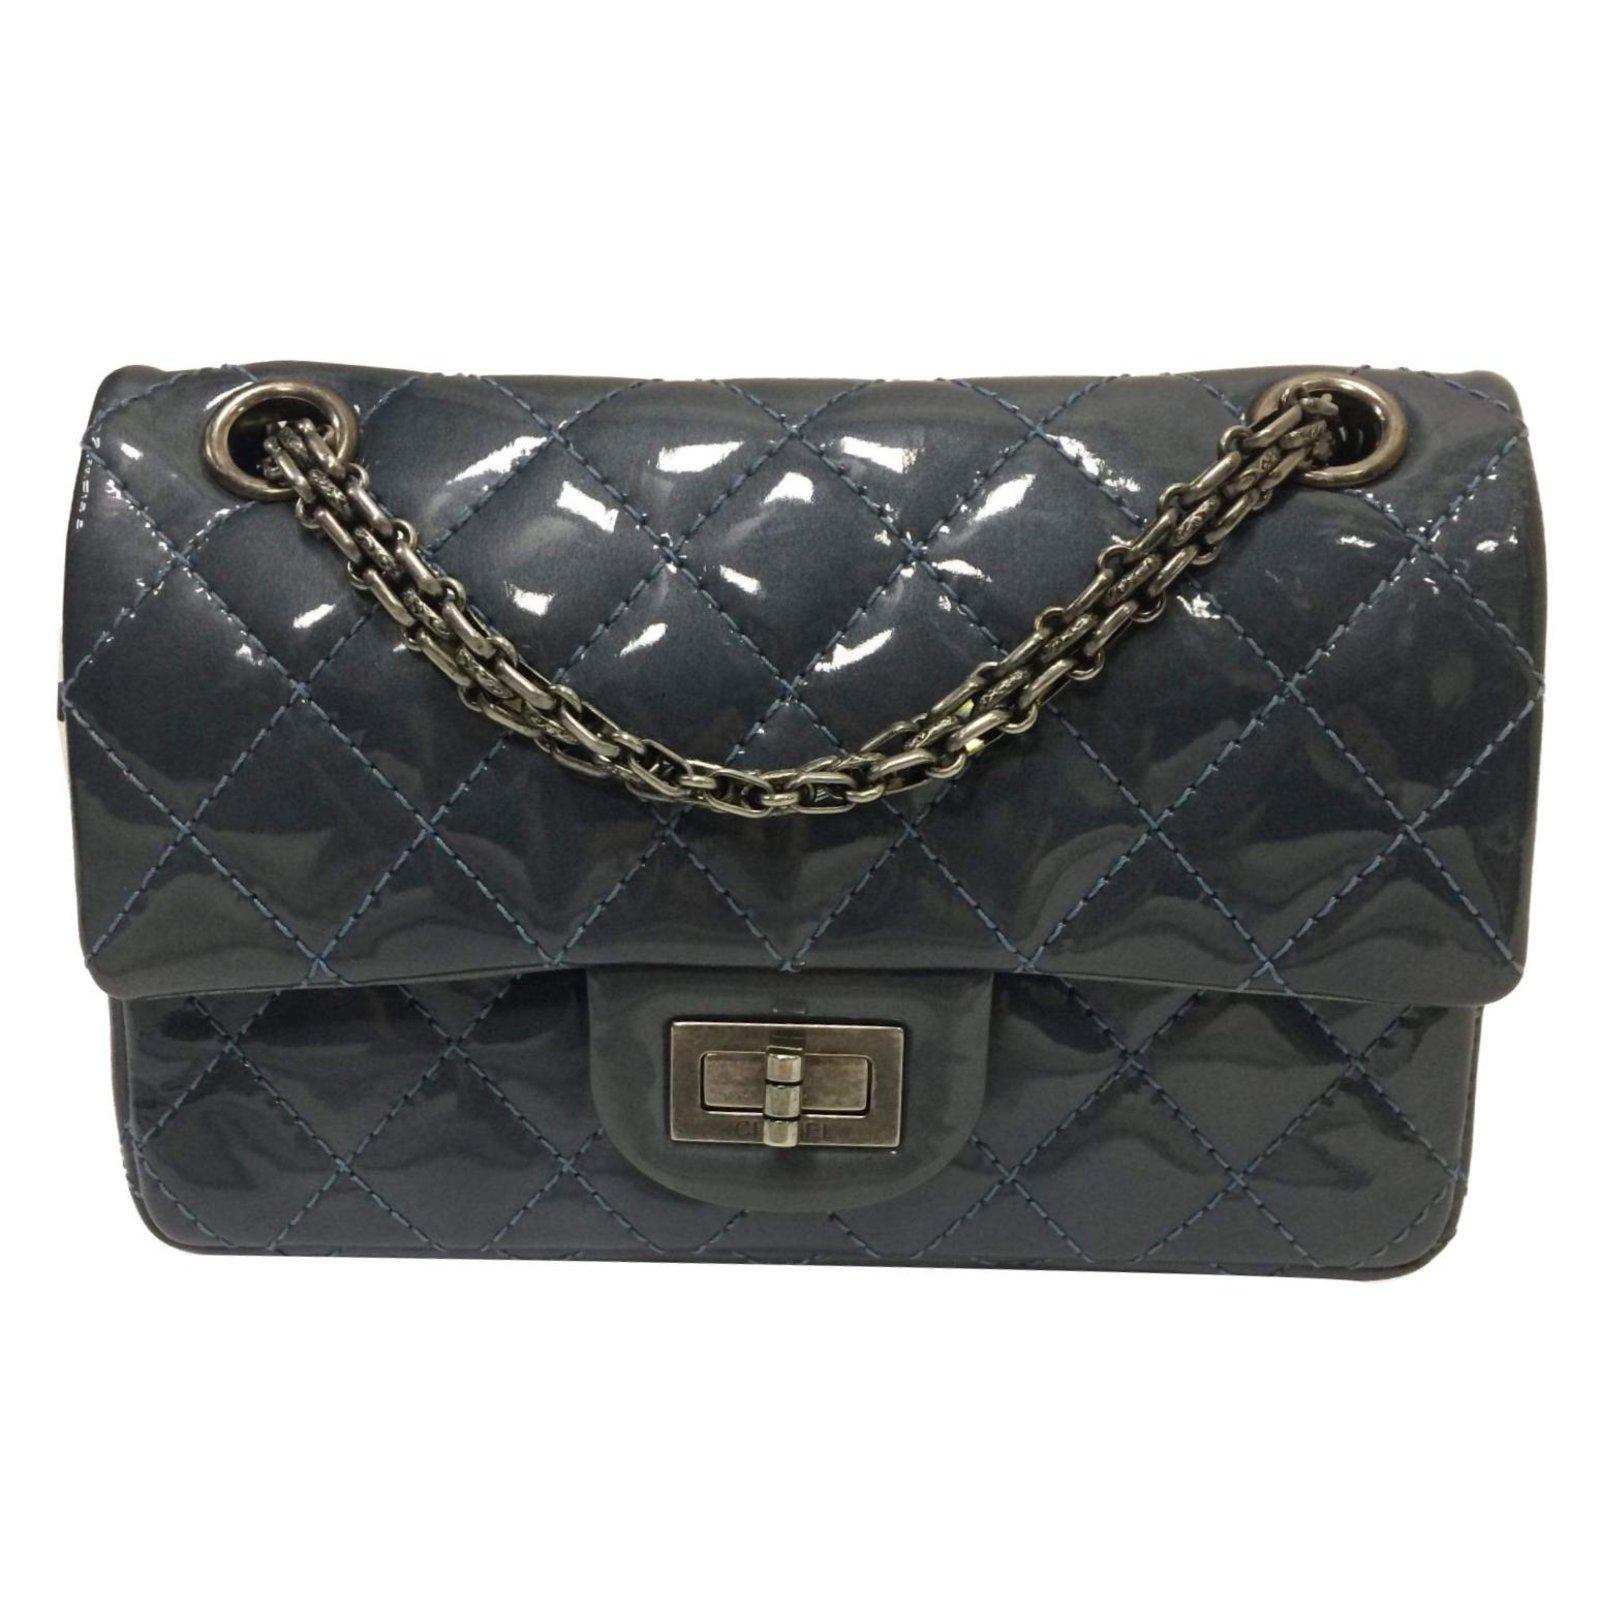 65f3e0958716ef Chanel 2.55 Handbags Patent leather Grey ref.72810 - Joli Closet